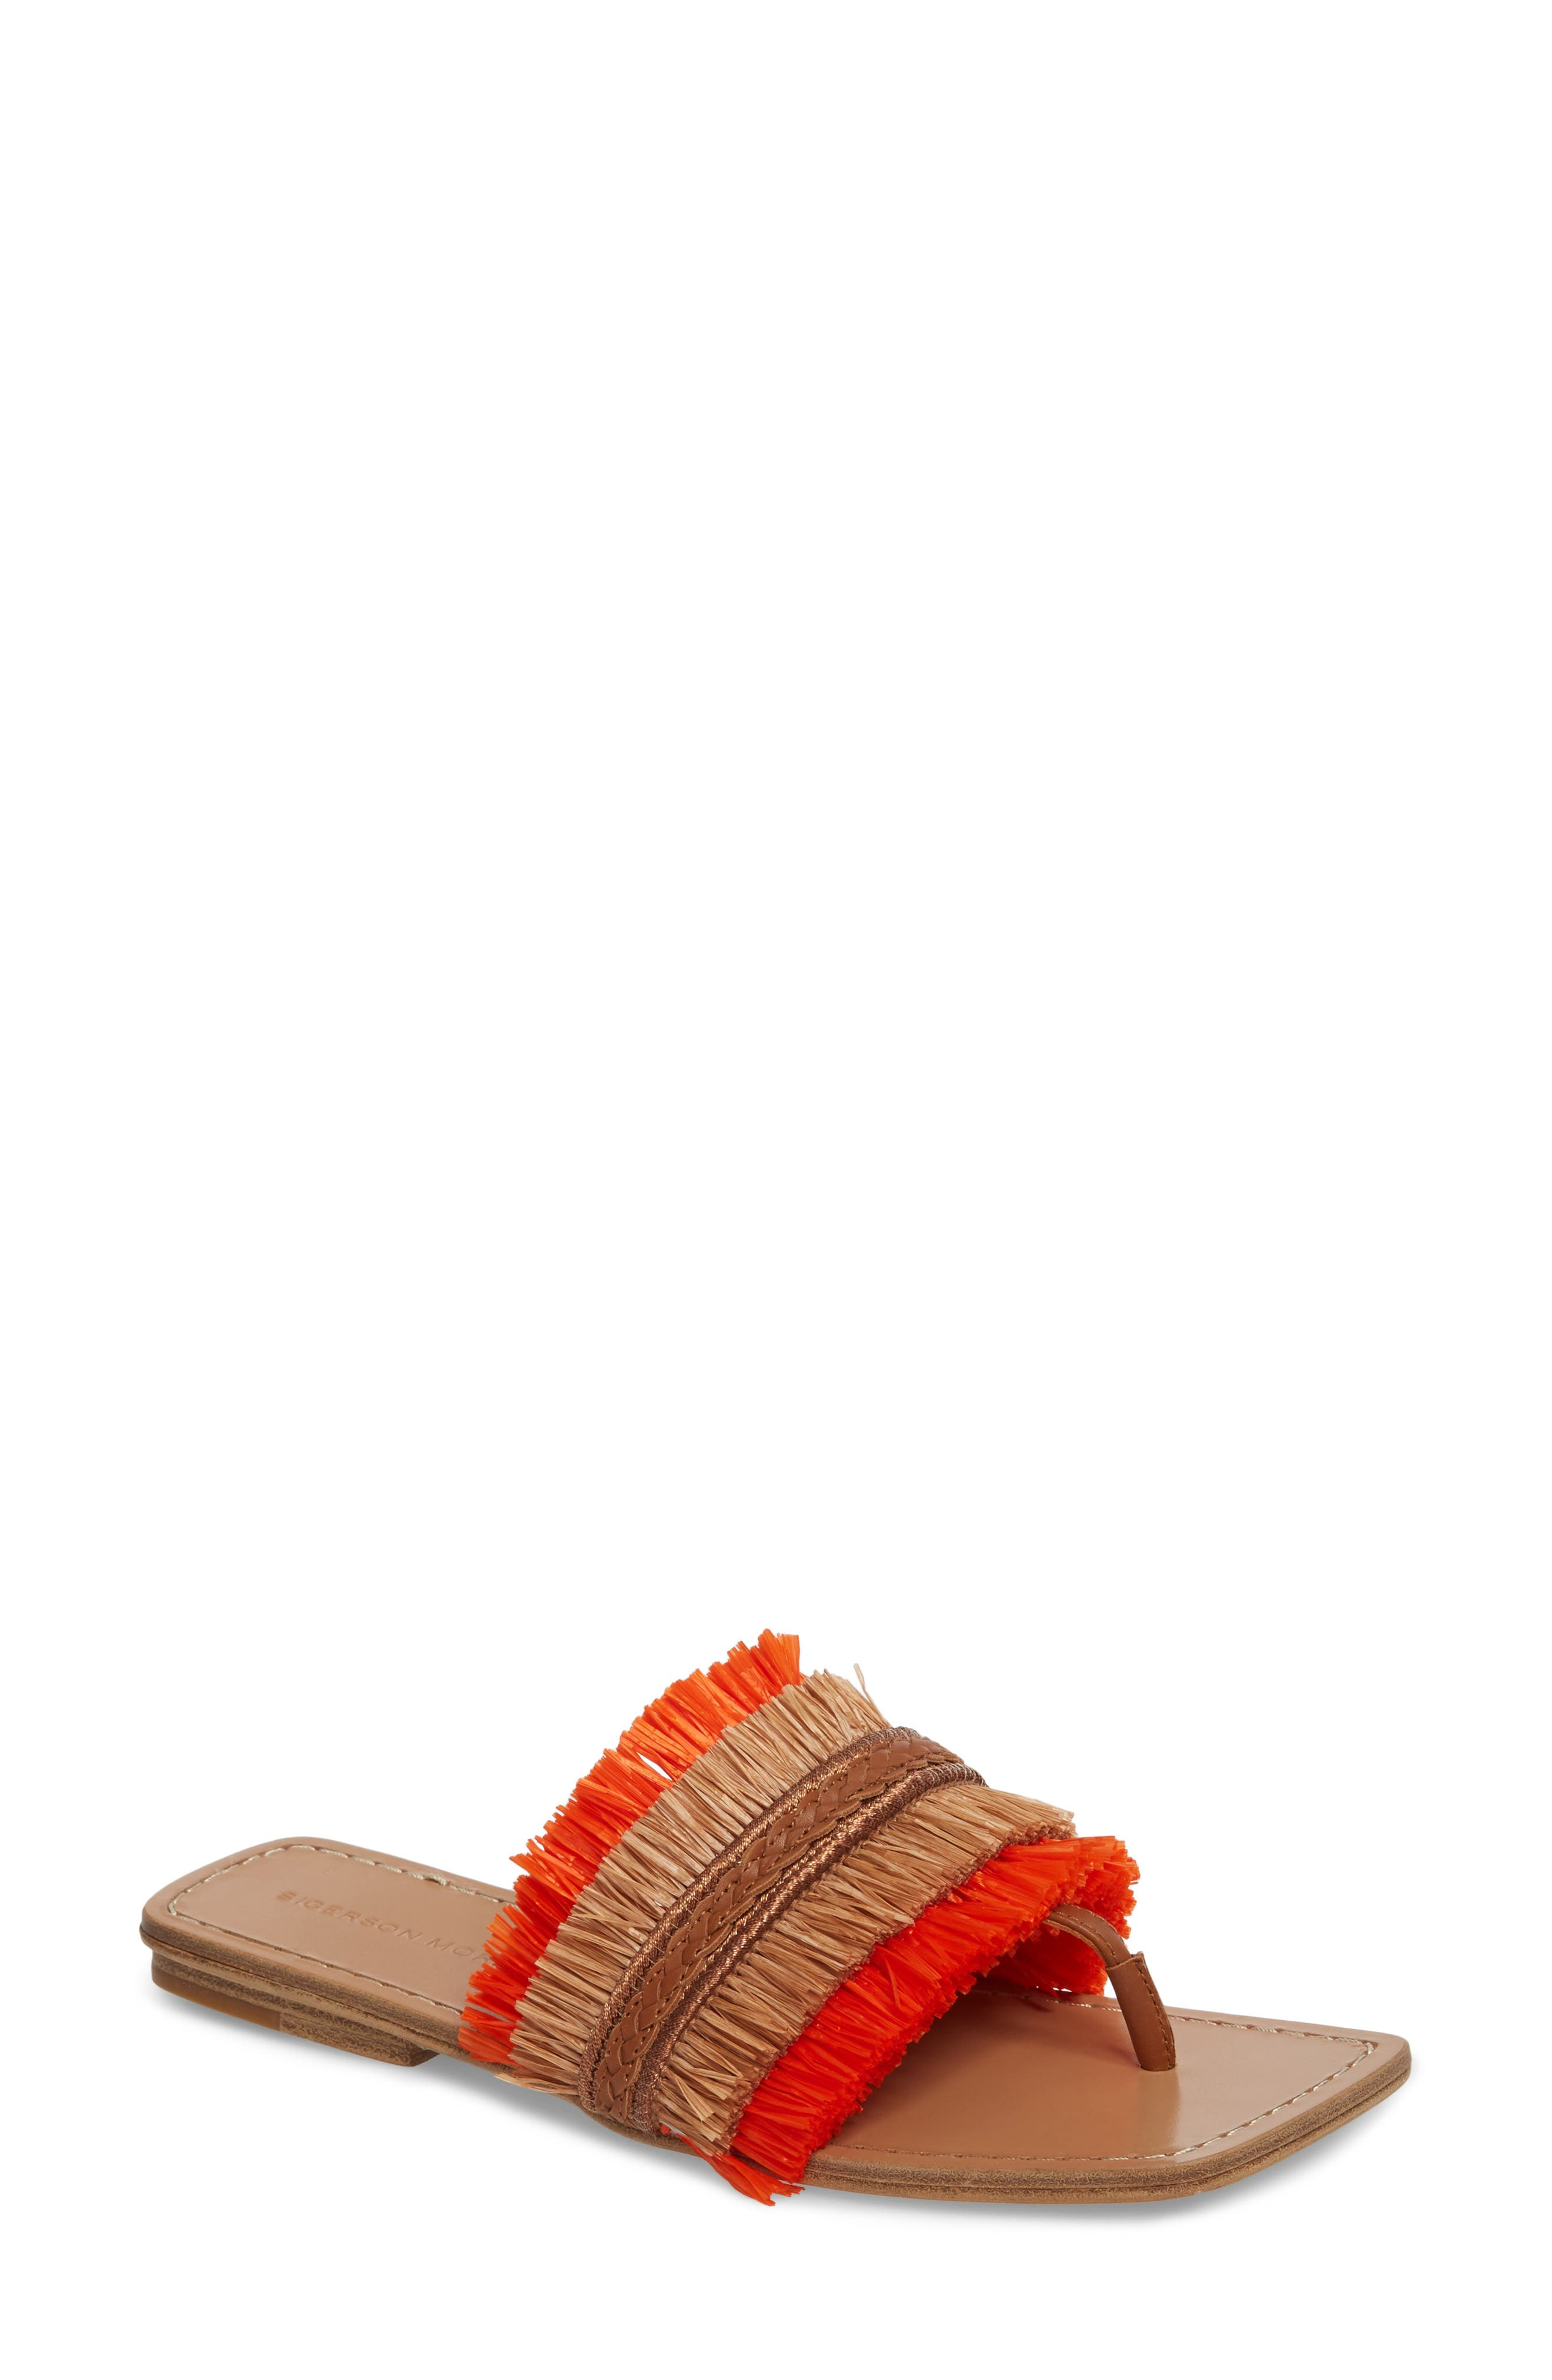 Woven Sandal,                         Main,                         color, Tan/ Orange